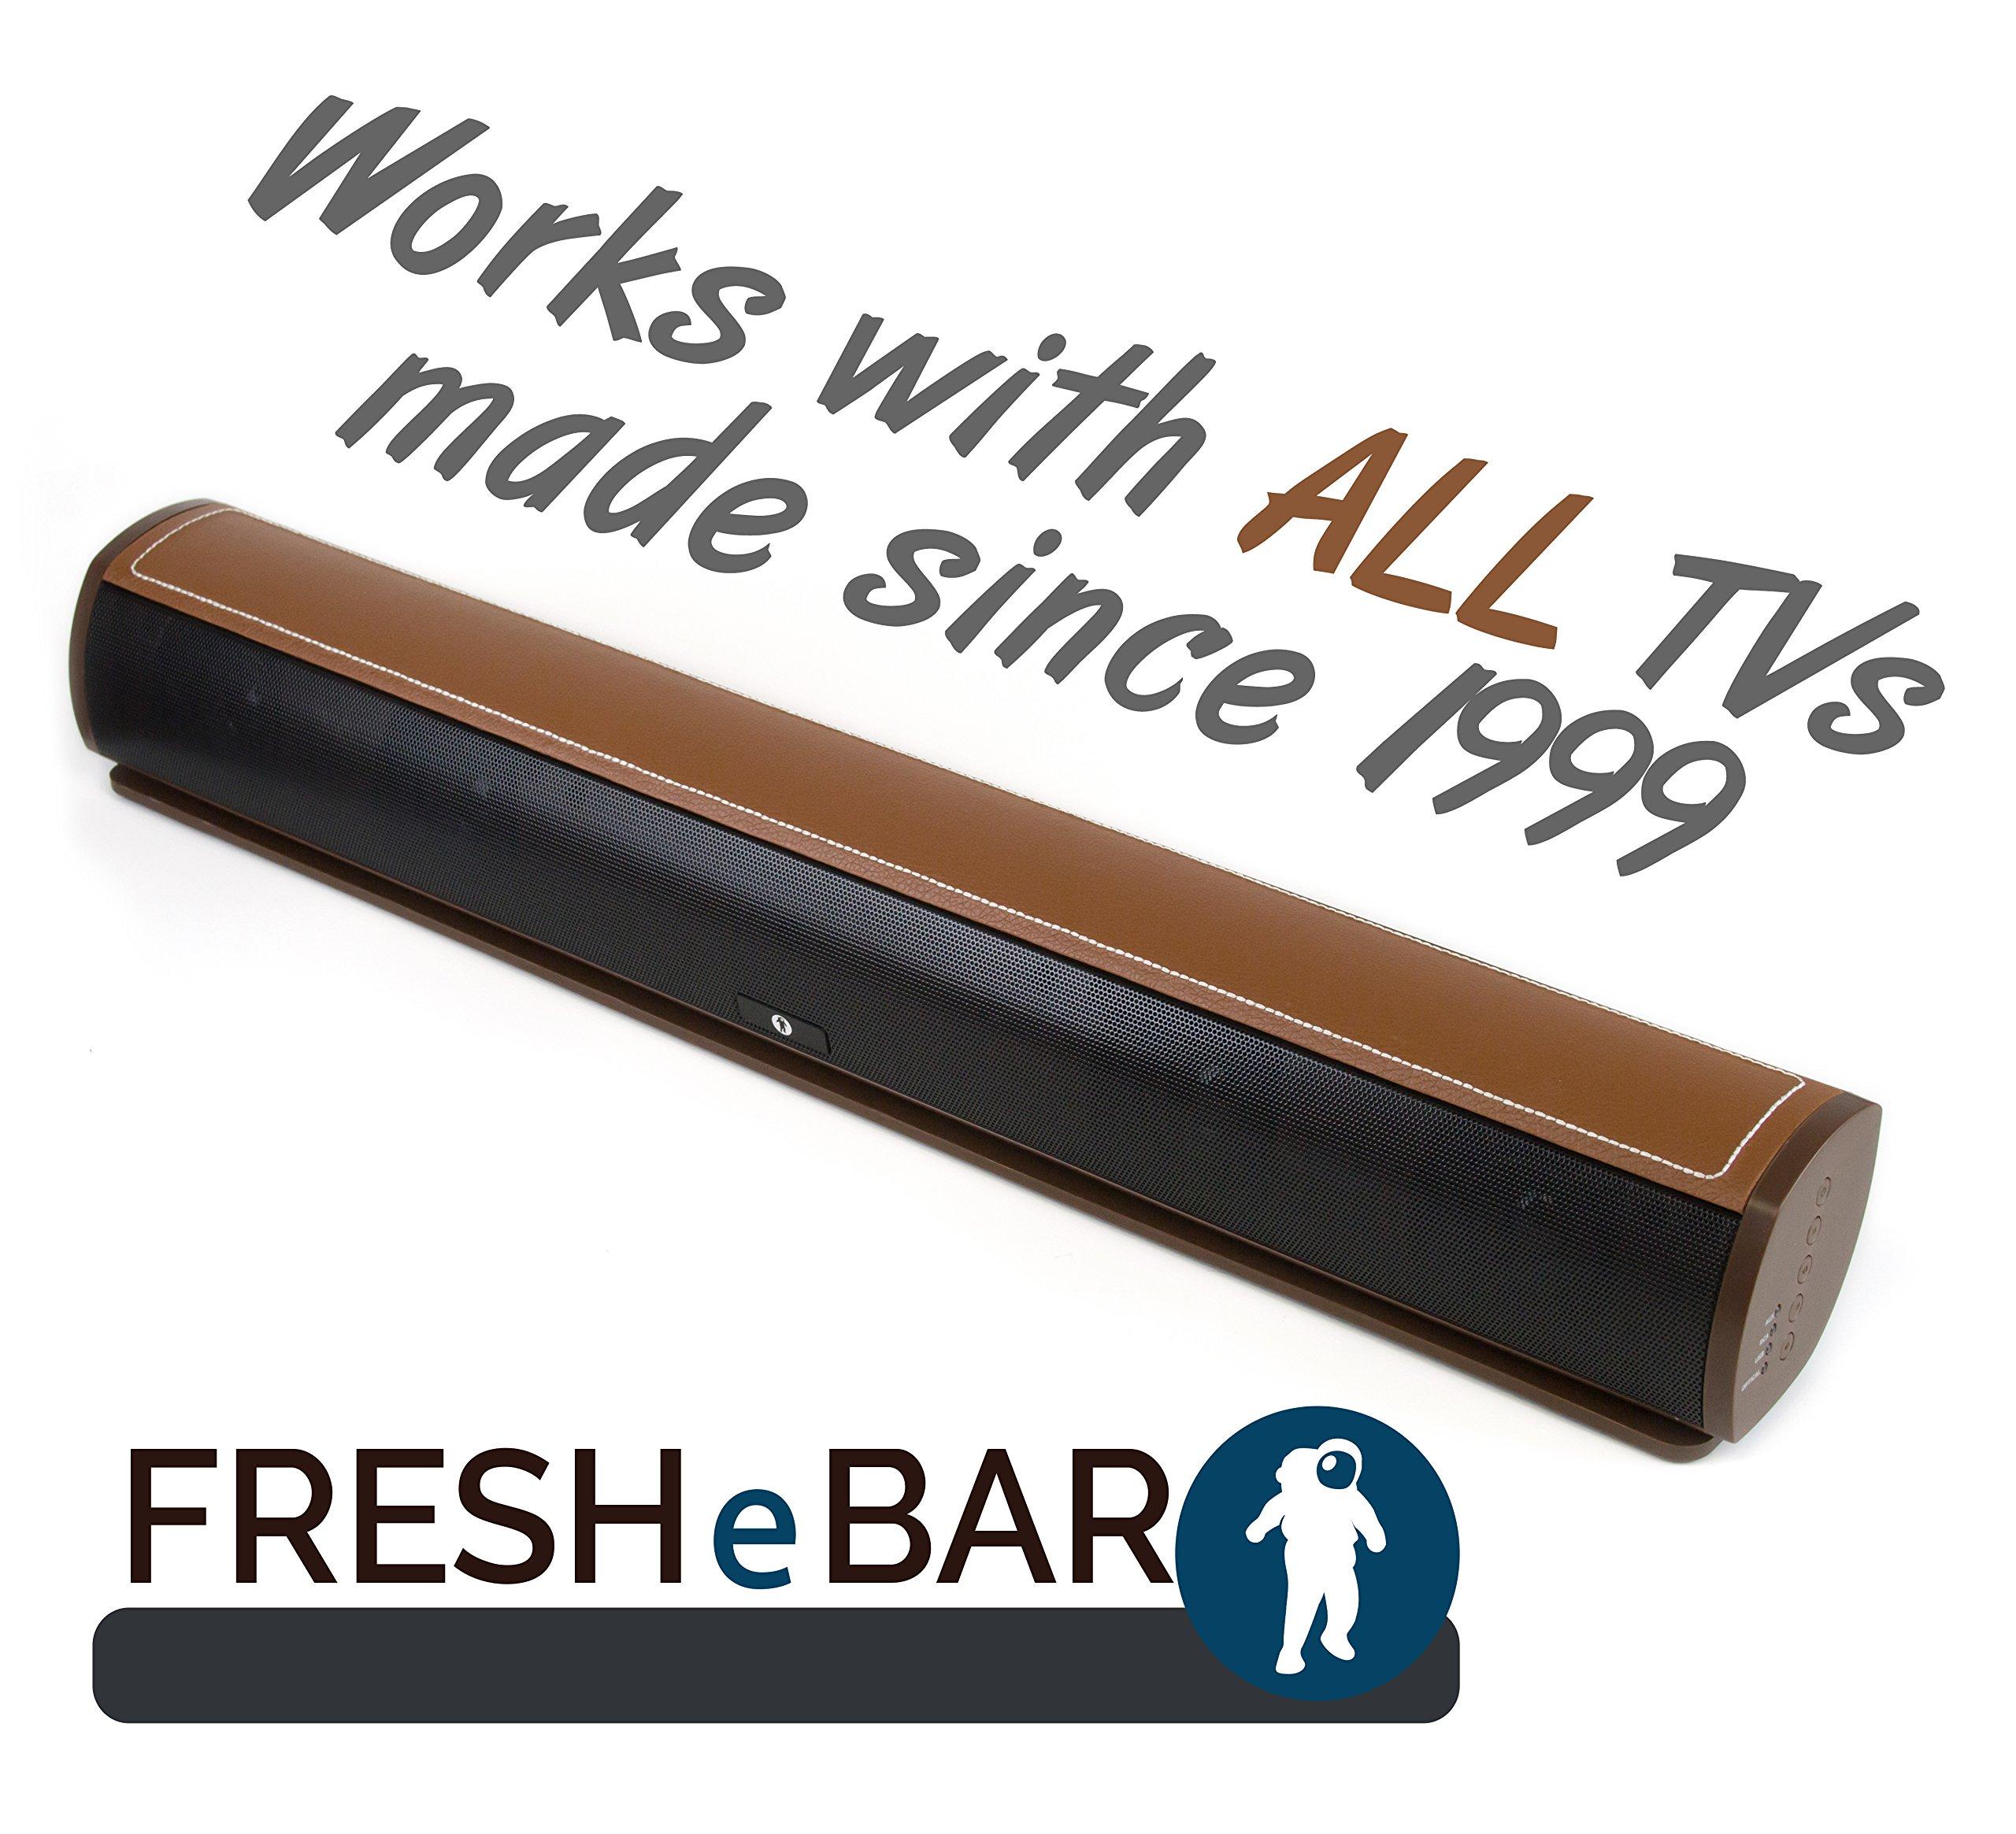 Bluetooth Leather Television Sound Bar - FRESHeBAR TV Soundbar - 24 inch, 90 Watt with Built-in Subwoofer - Dark Brown / Brown Leather